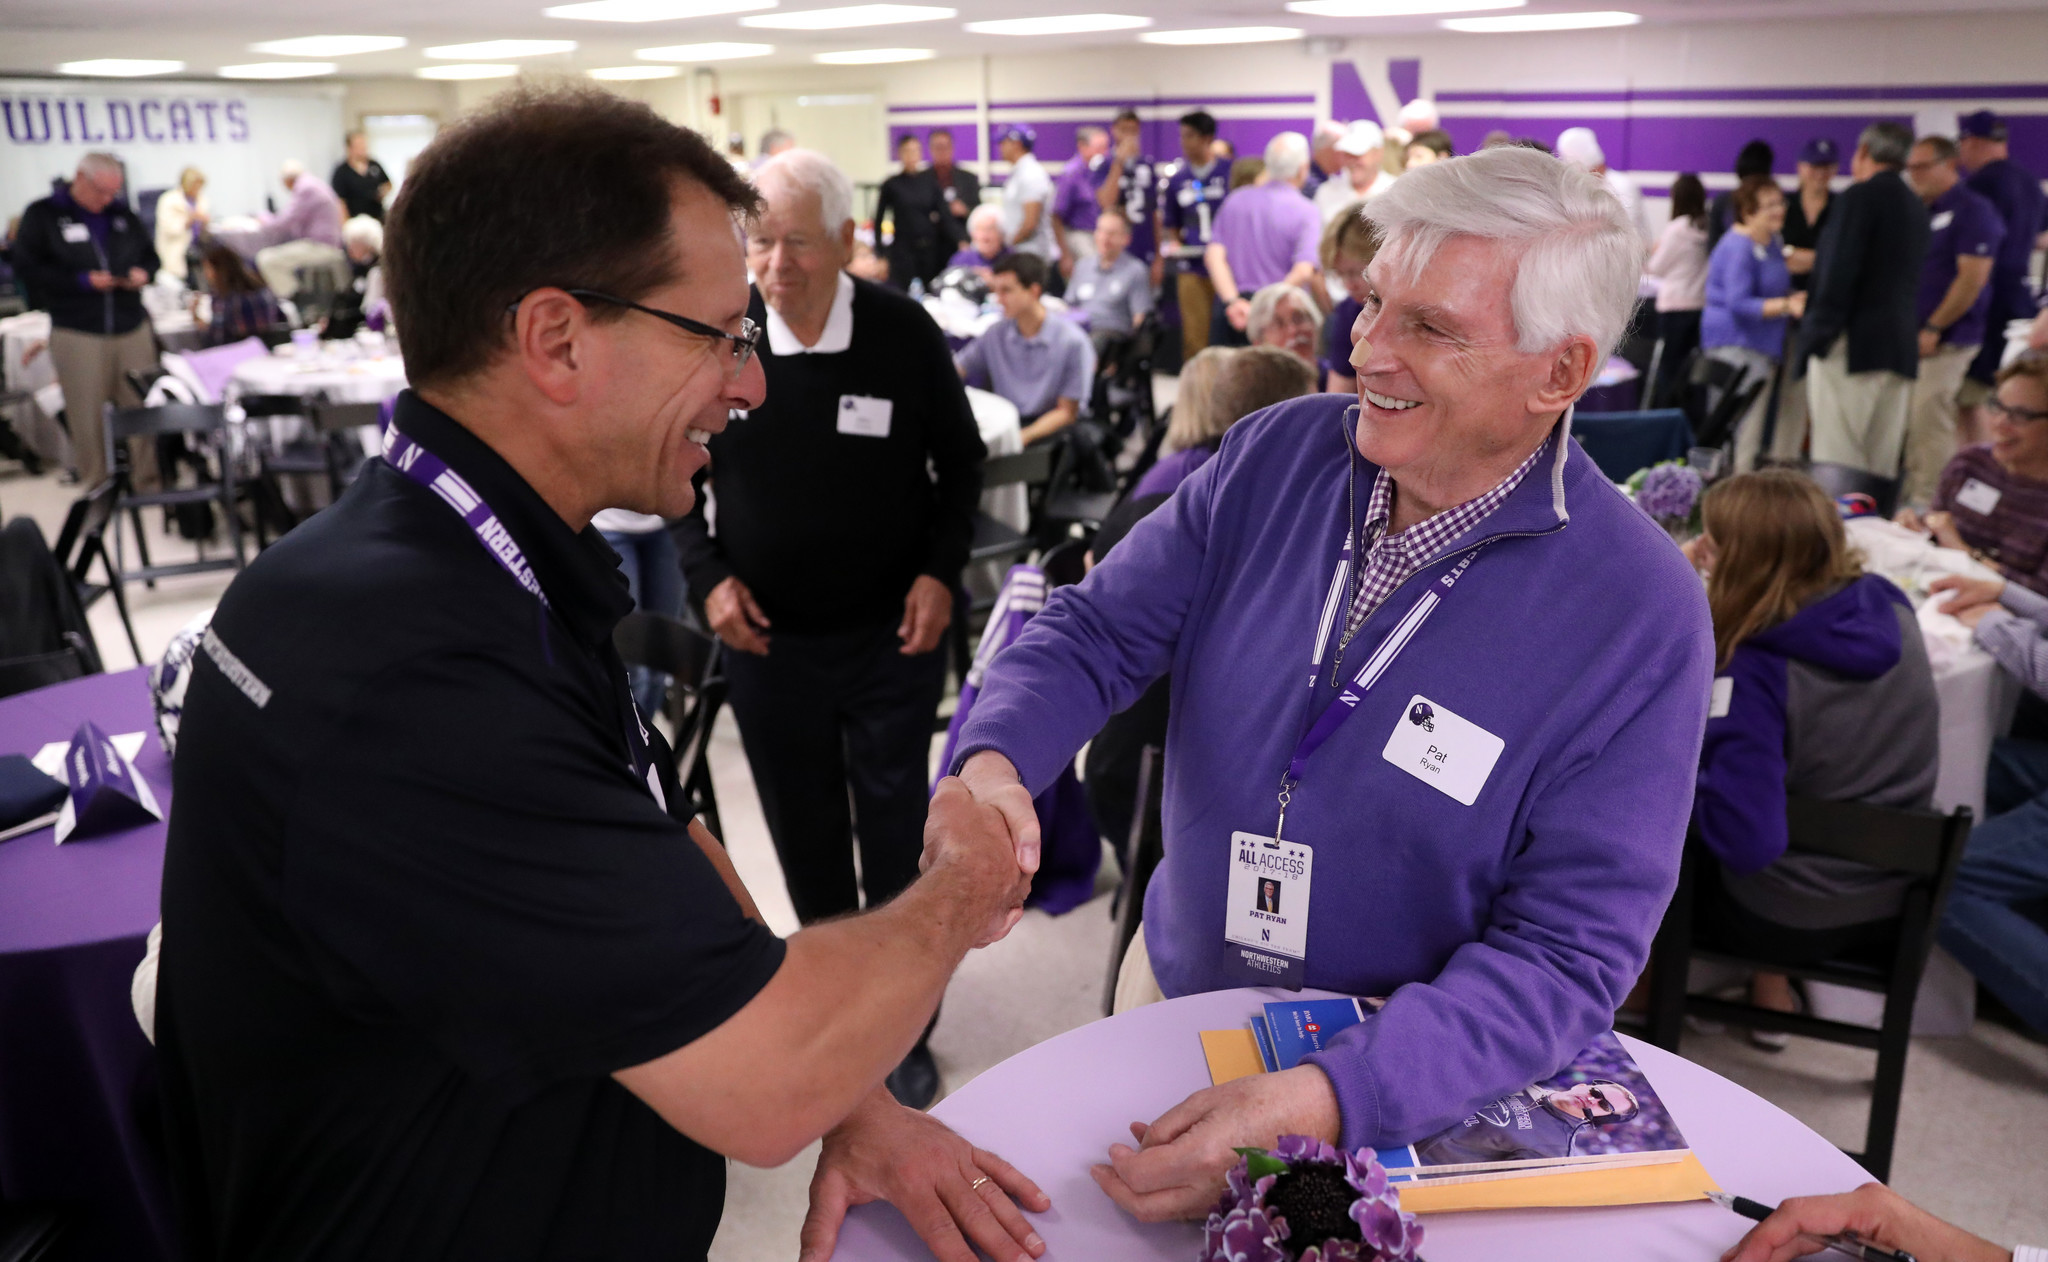 A Humble Elusive Billionaire Northwestern Donor Pat